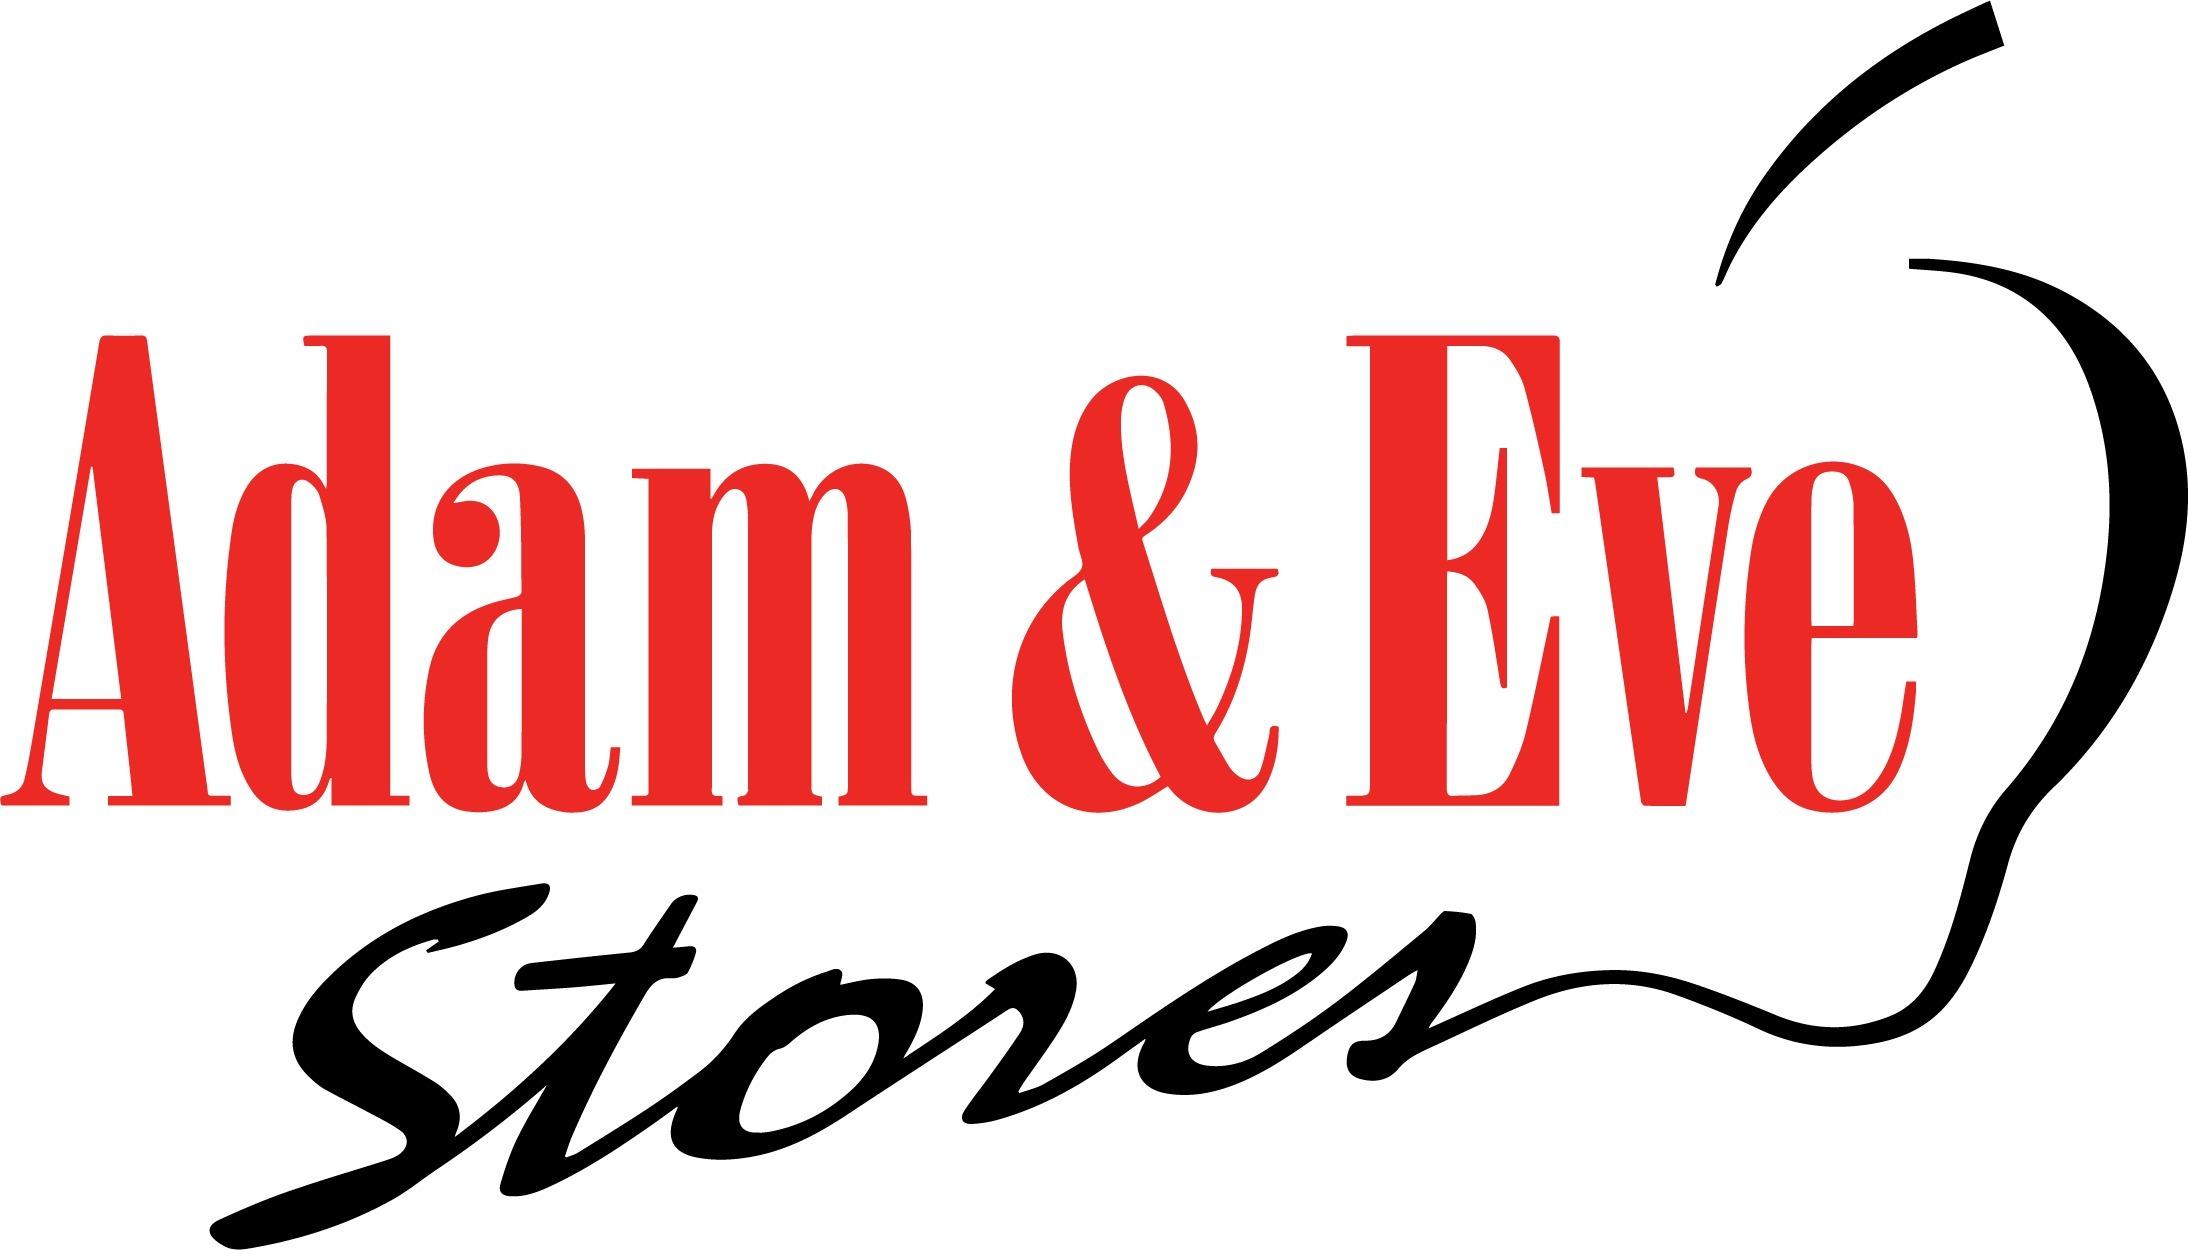 Adam & Eve Stores Chesapeake (@adamevechesa1) Cover Image